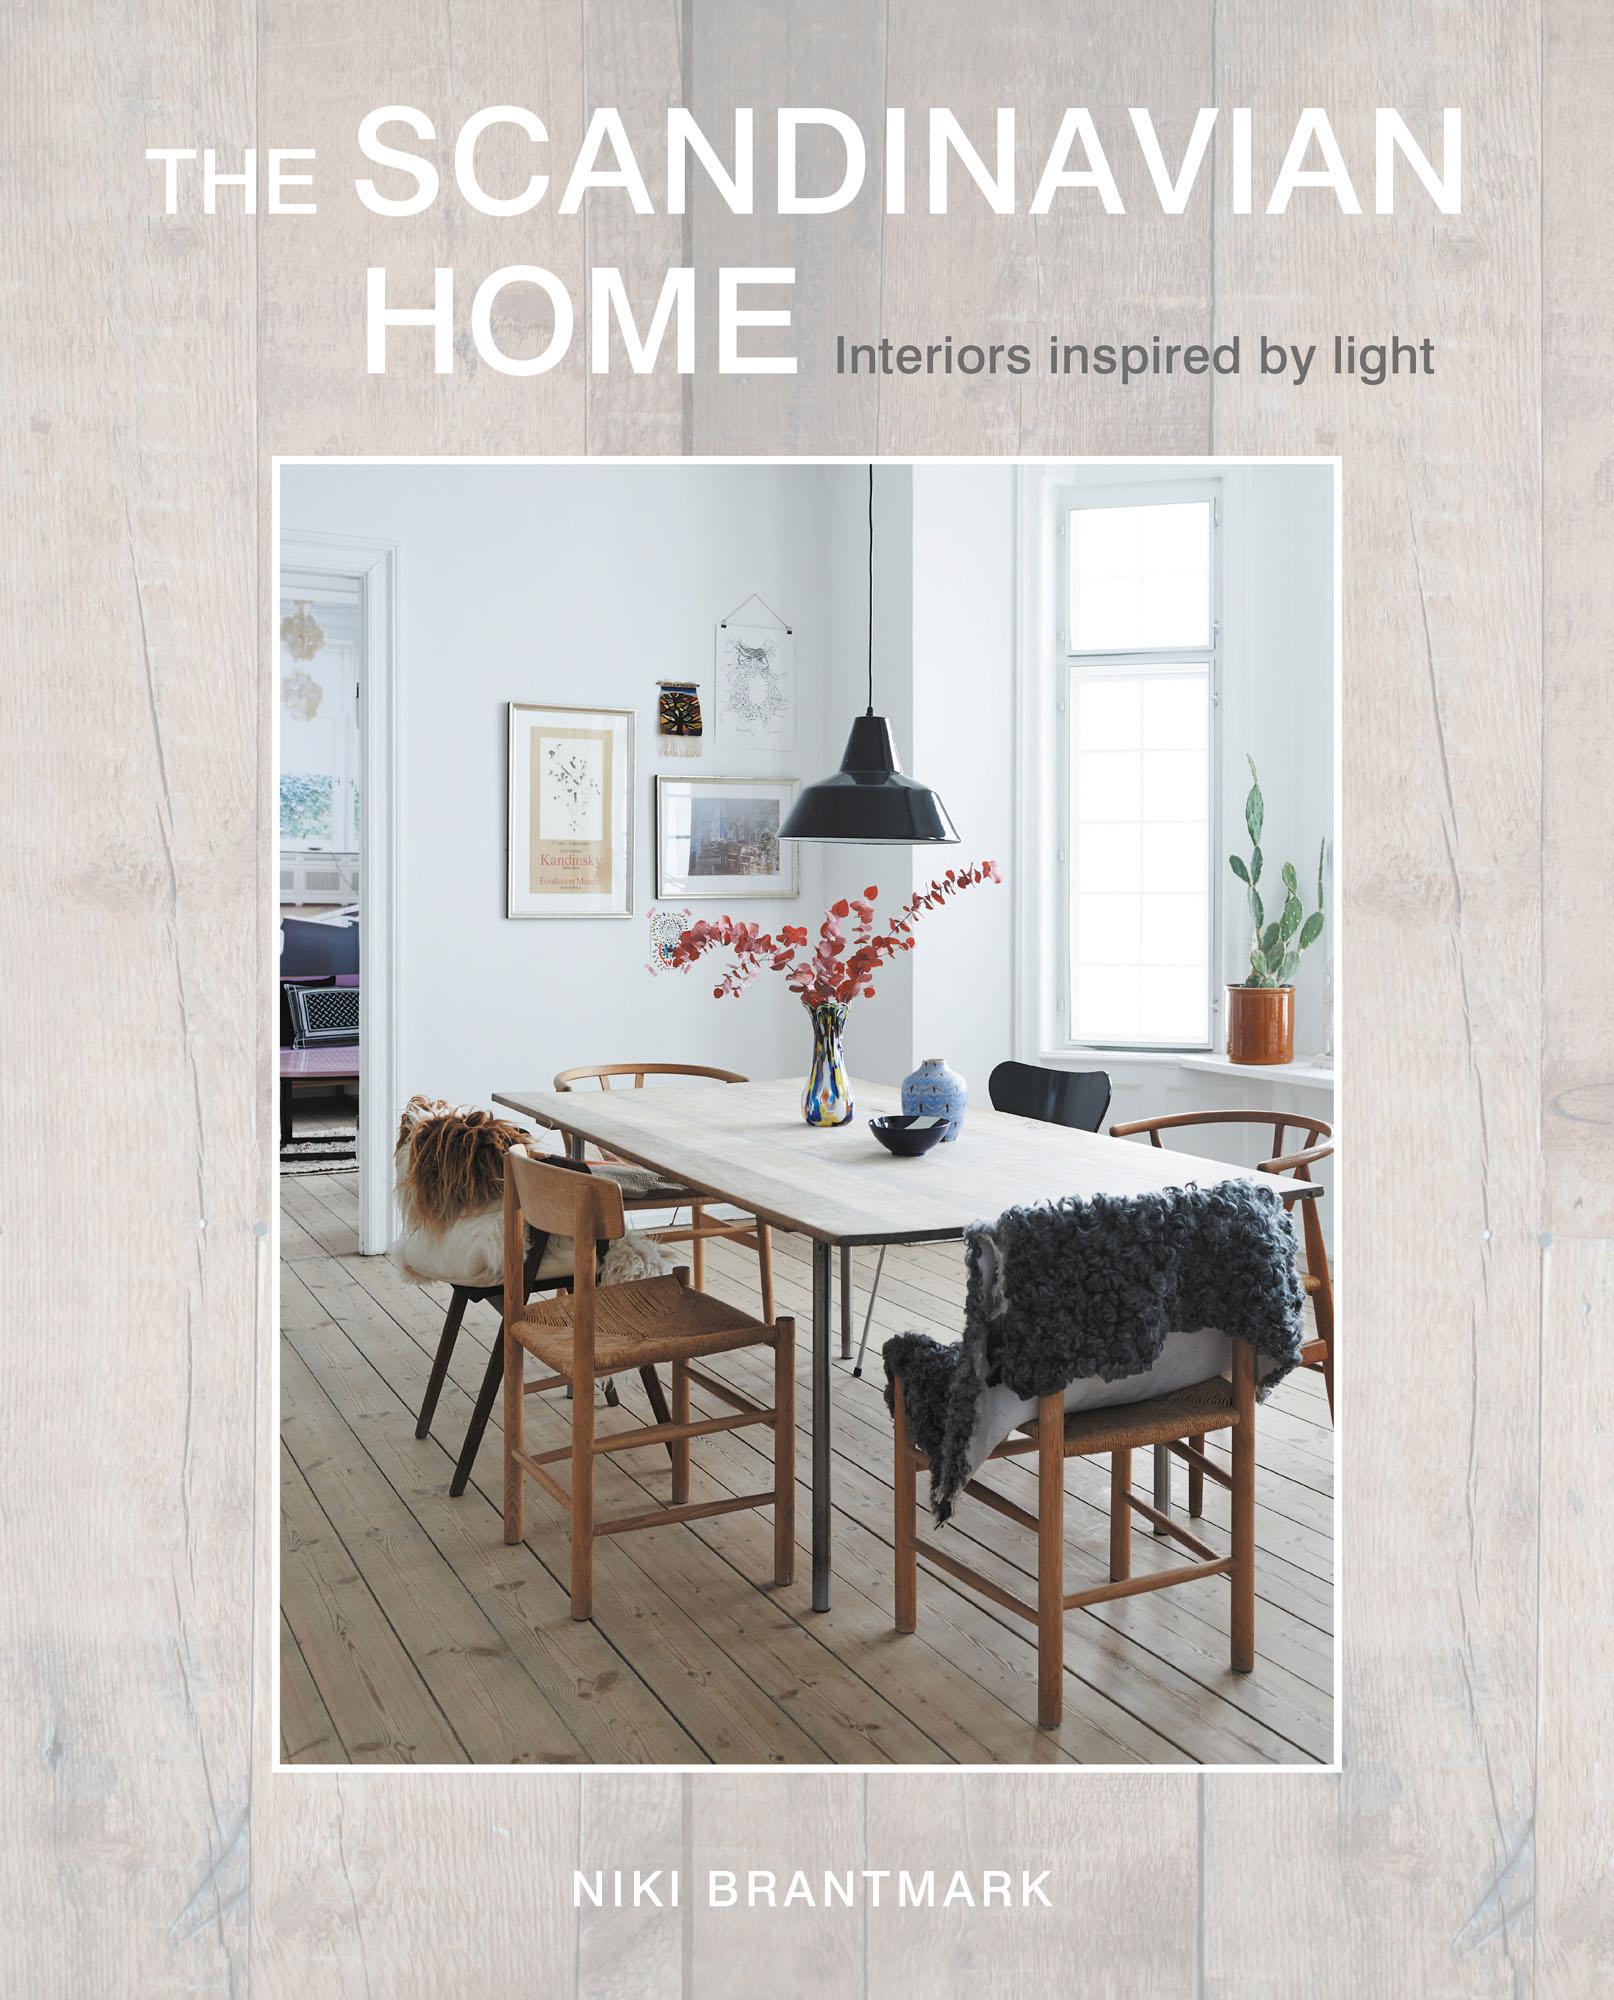 The Scandinavian Home book